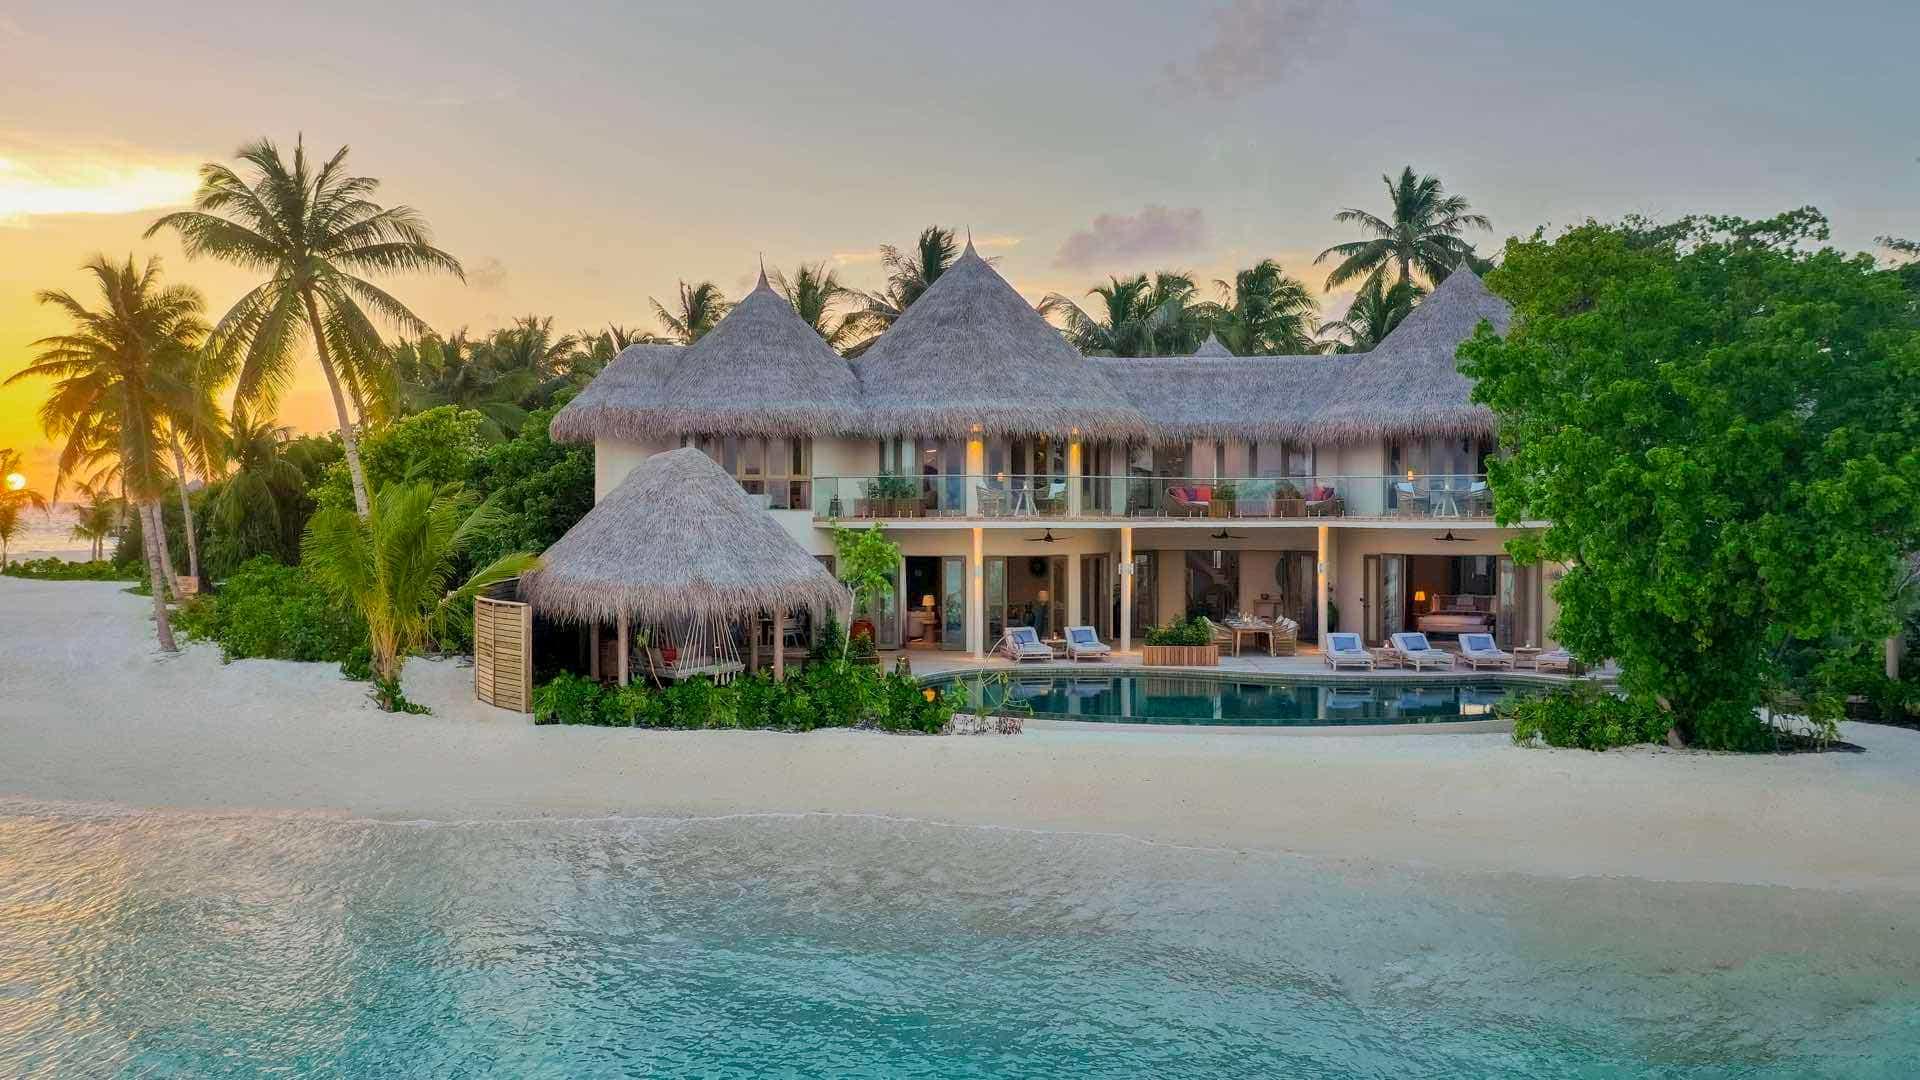 Resort Maldive The Nautilus Maldives mansion